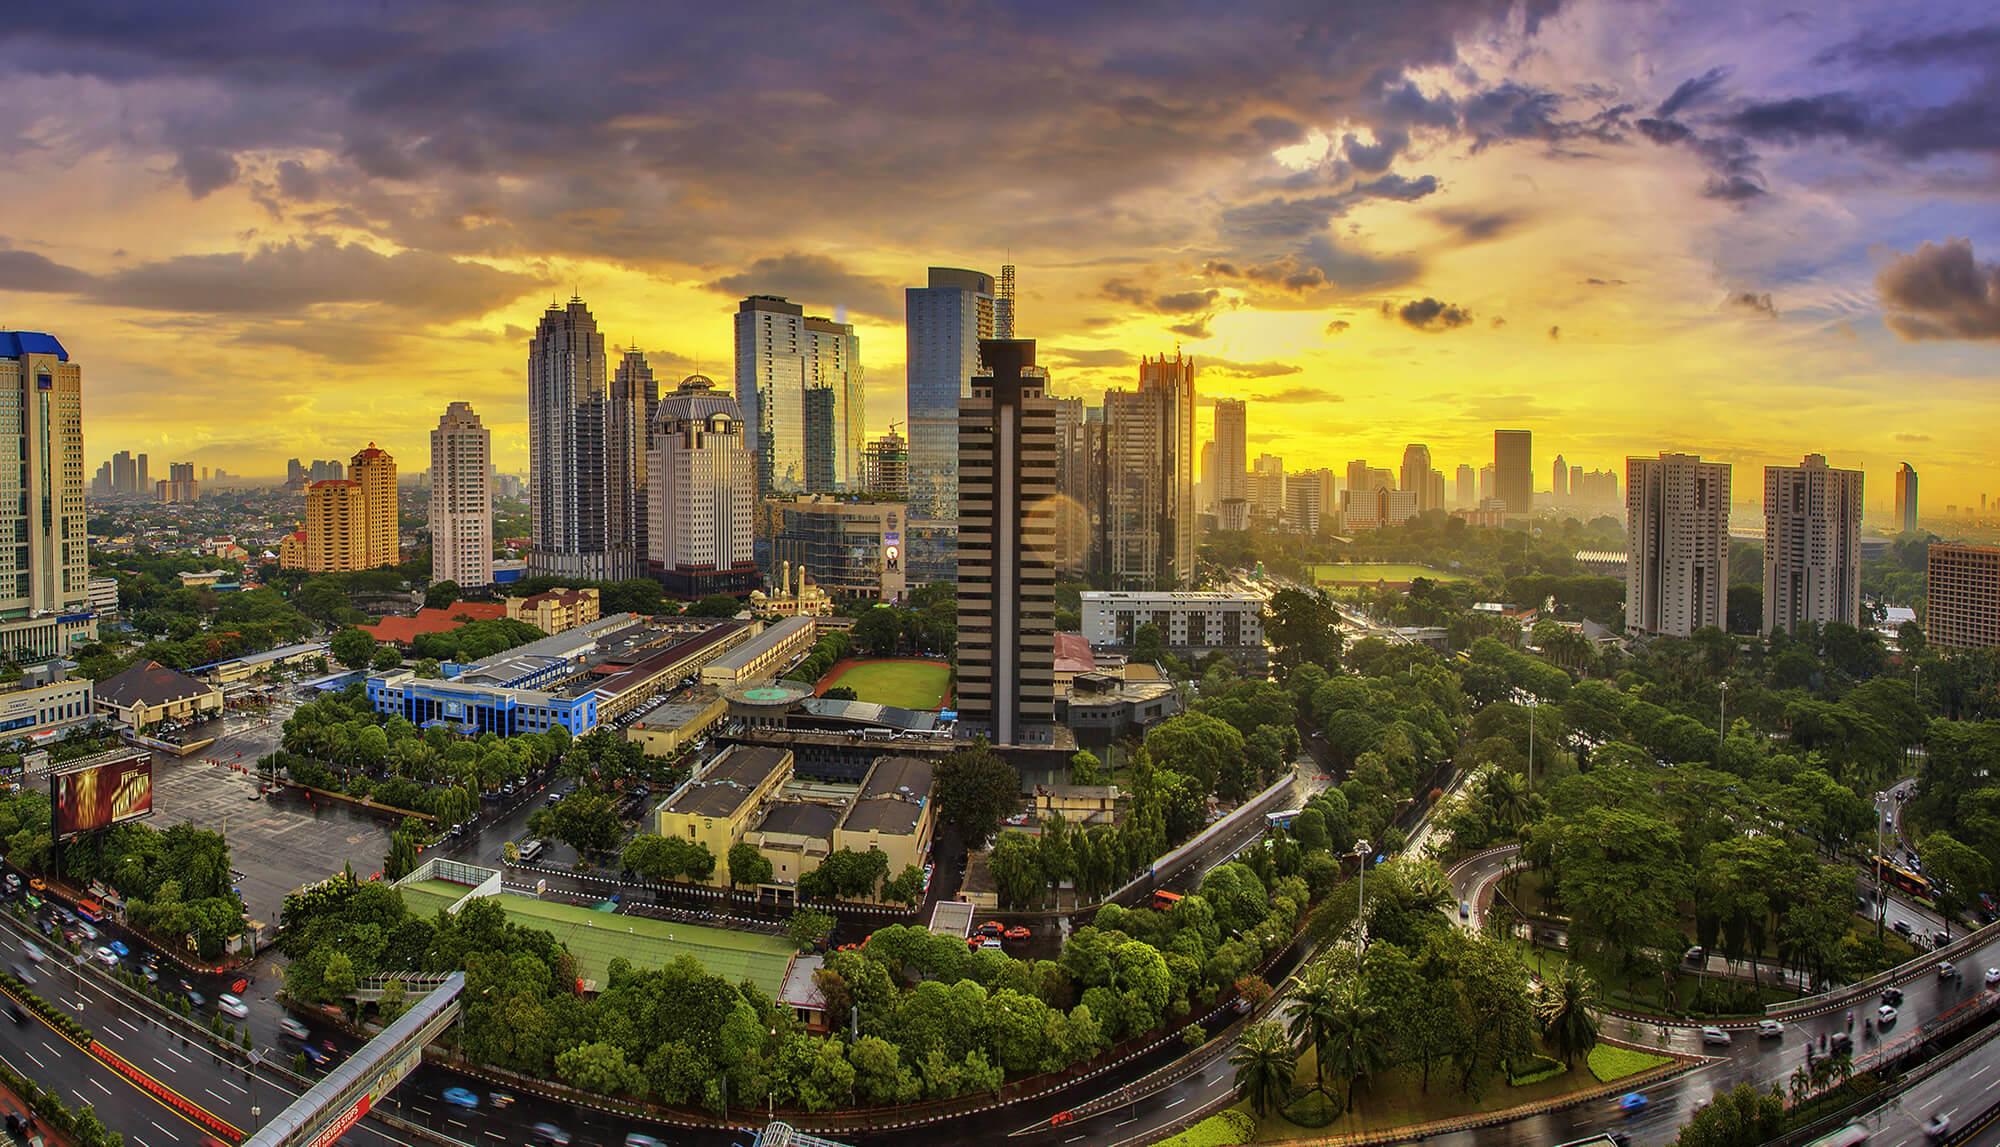 Capital Region of Jakarta, Indonesia